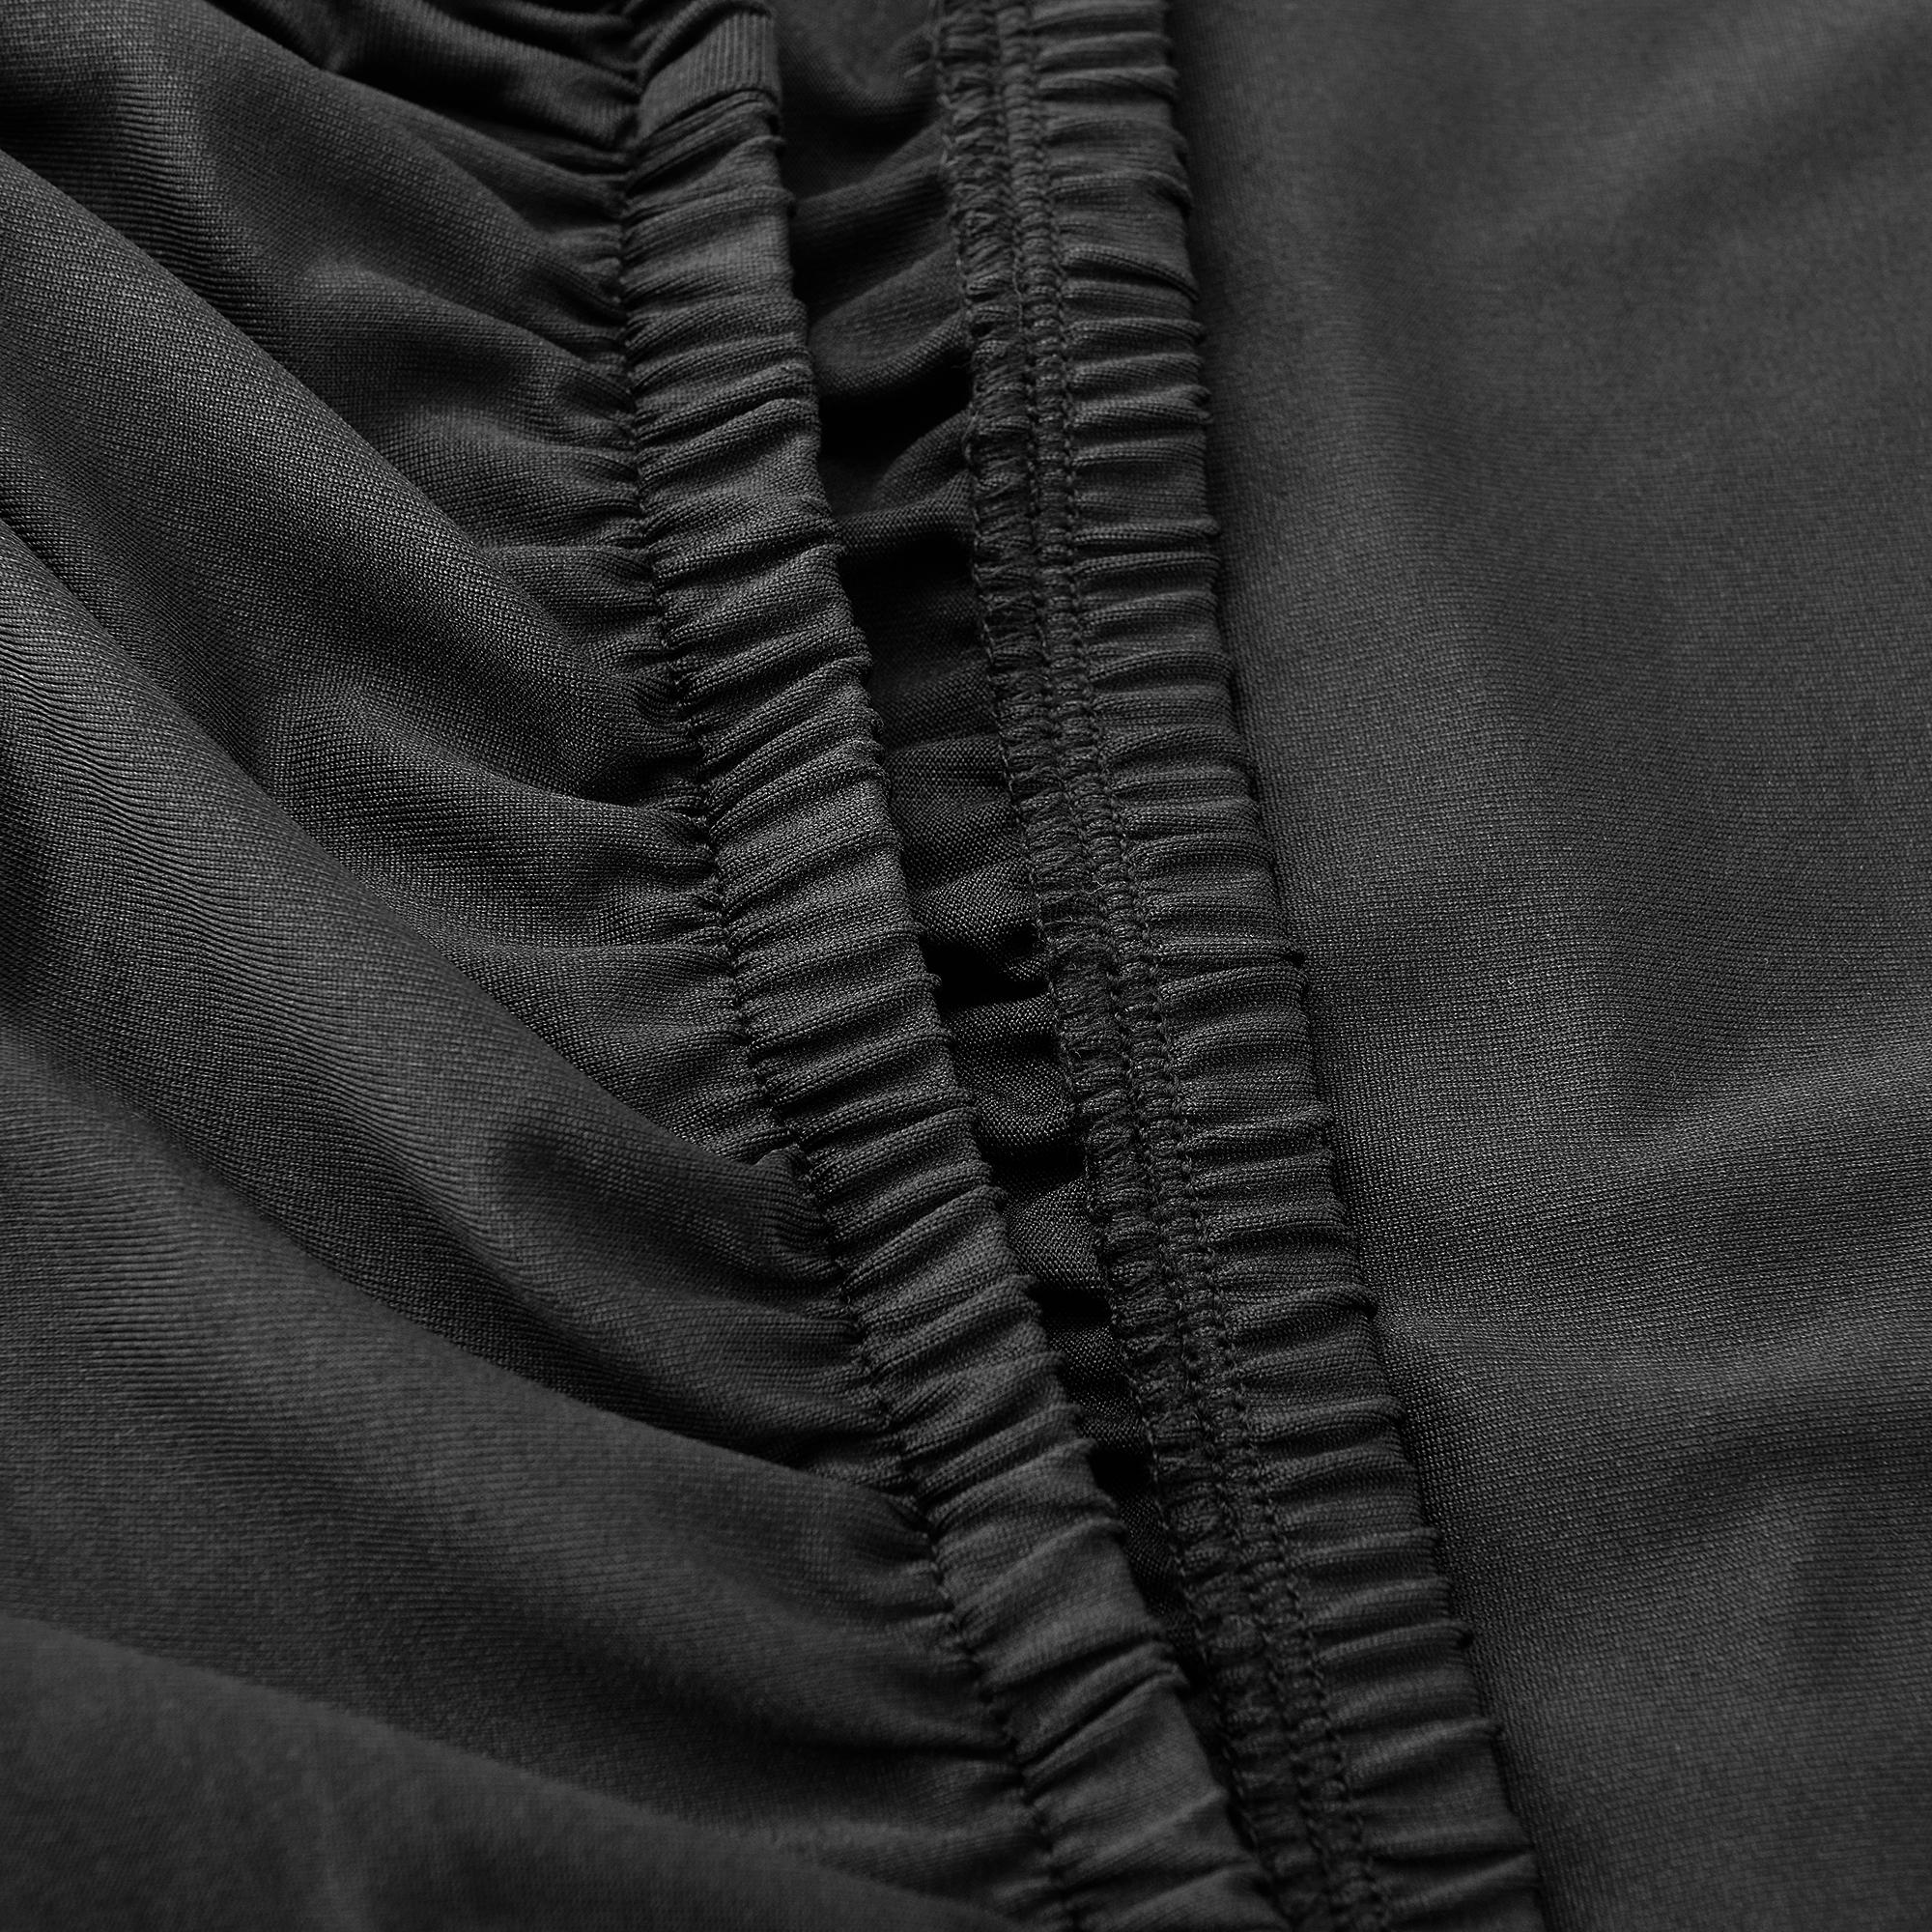 ® 4//6x Stuhlhusse 42-53cm Stretchhussen Stuhlbezüge Stuhlüberzug neu.haus